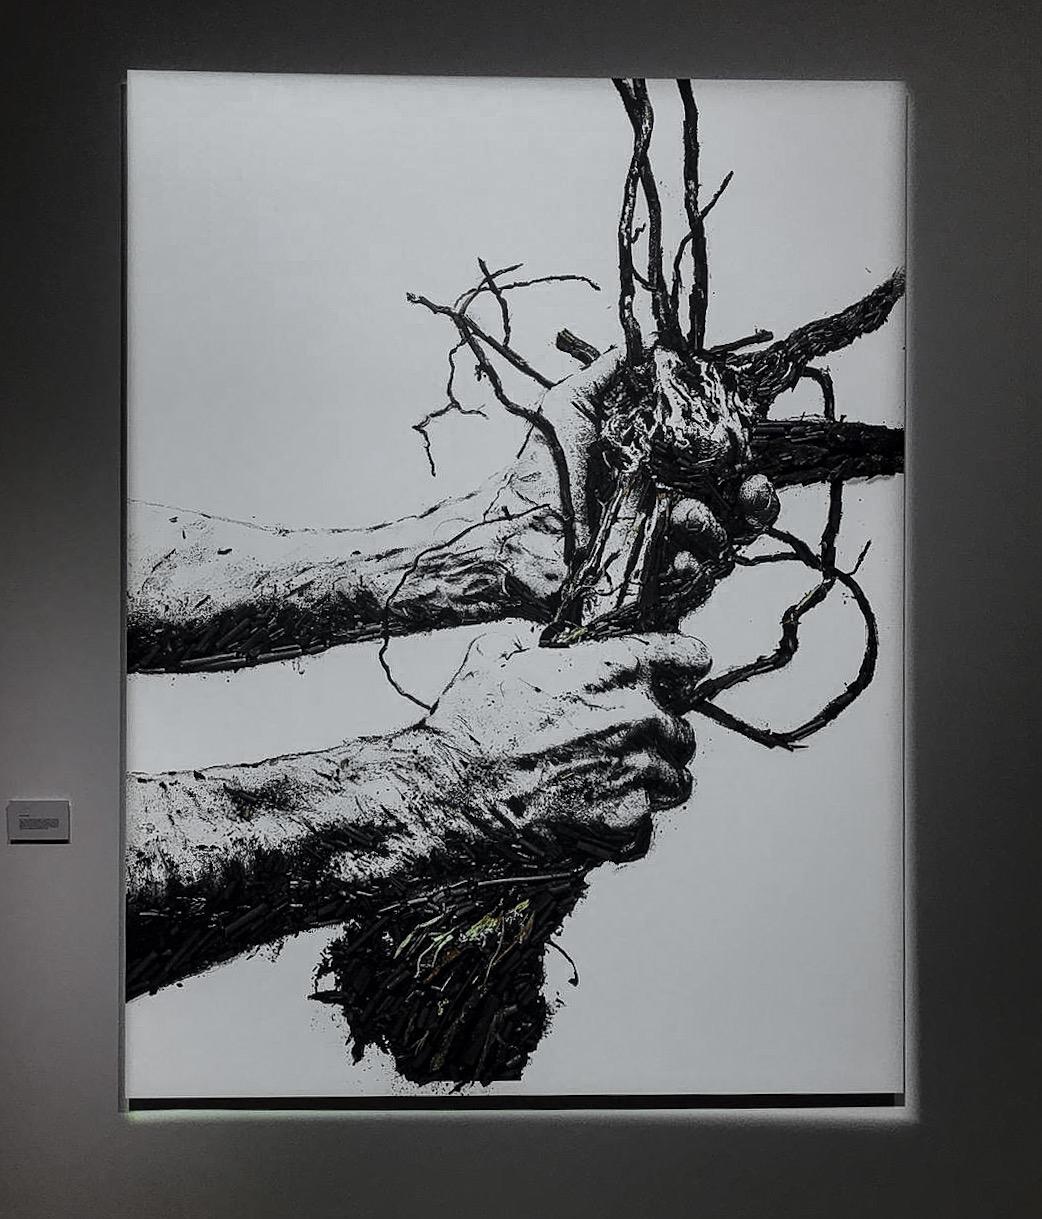 GUSTATORIAL_paper_VIk-Muniz-x-Ruinart_Flow-Hands.jpg